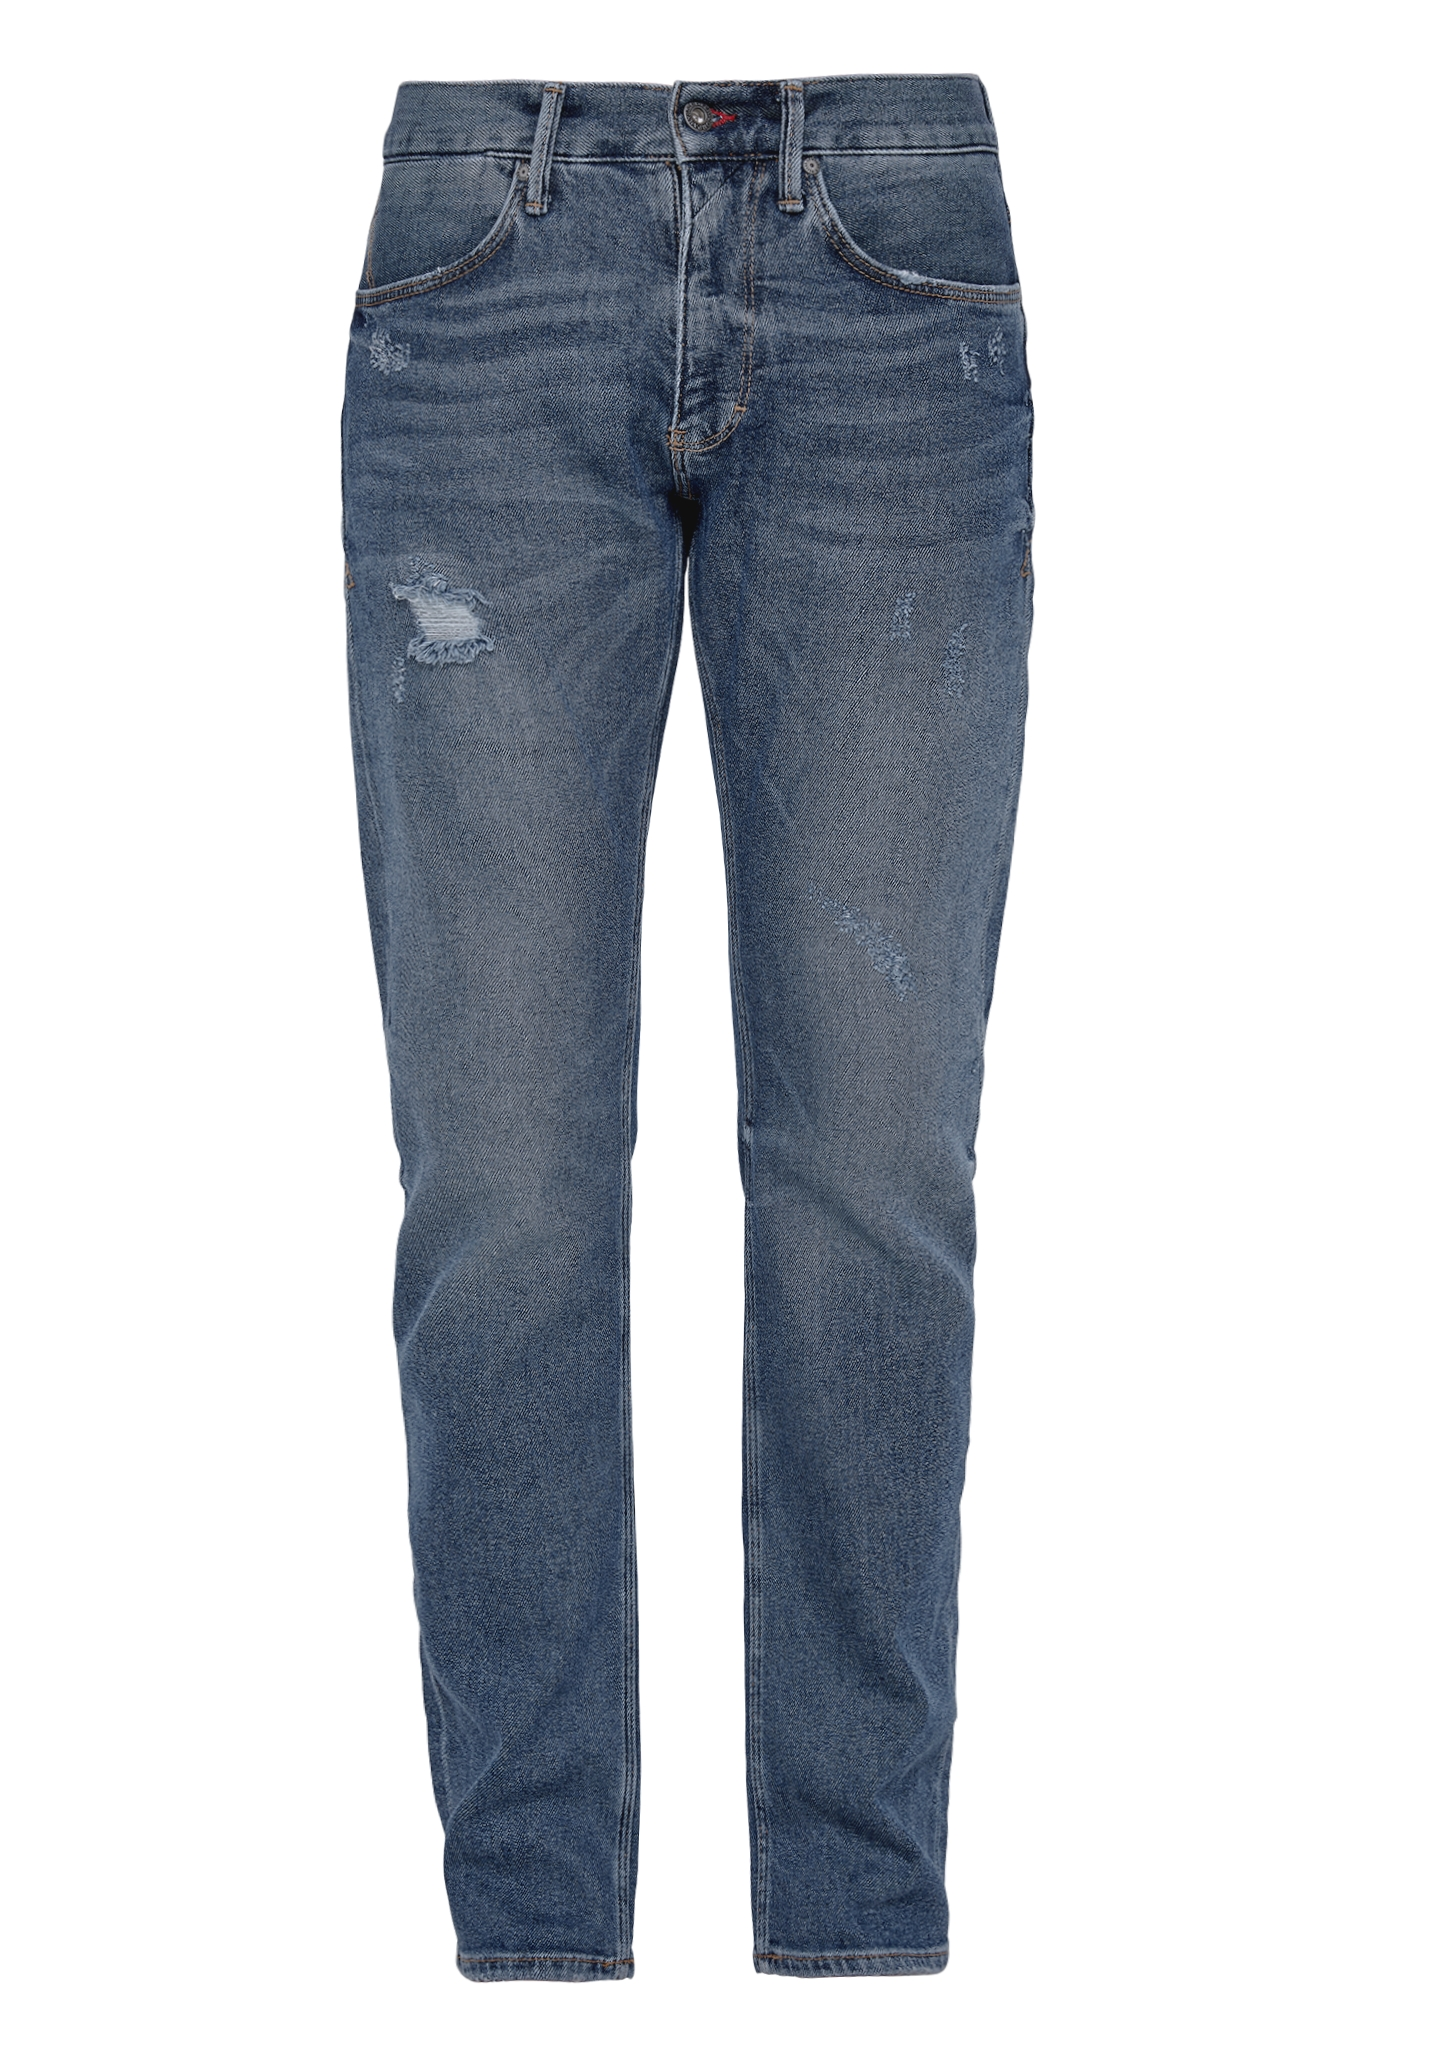 Jeans | Bekleidung > Jeans | Blau | Obermaterial 99% baumwolle -  1% elasthan| futter 67% polyester -  33% baumwolle | s.Oliver